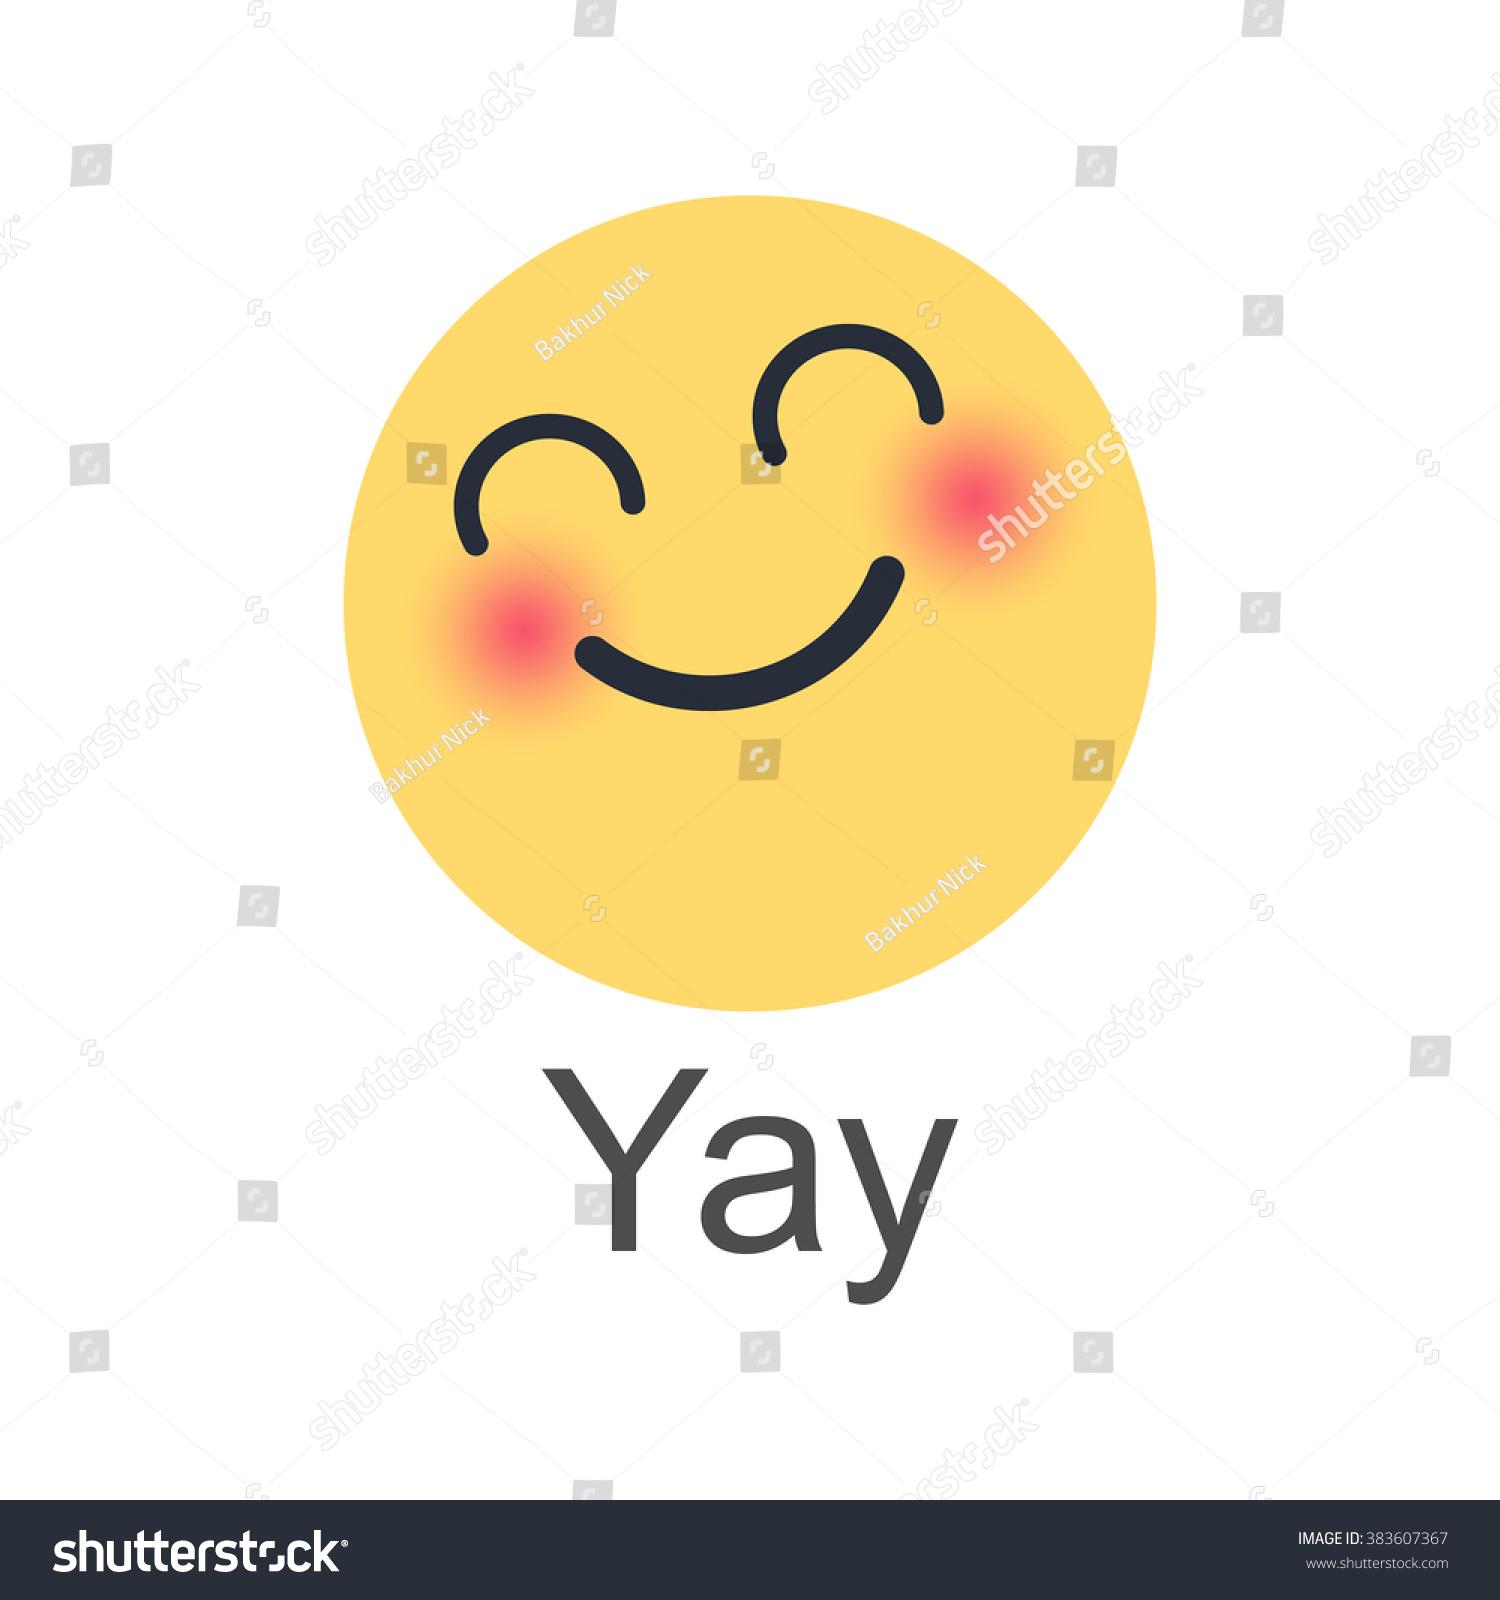 Yay New Like Button Empathetic Emoji」のイラスト素材 383607367